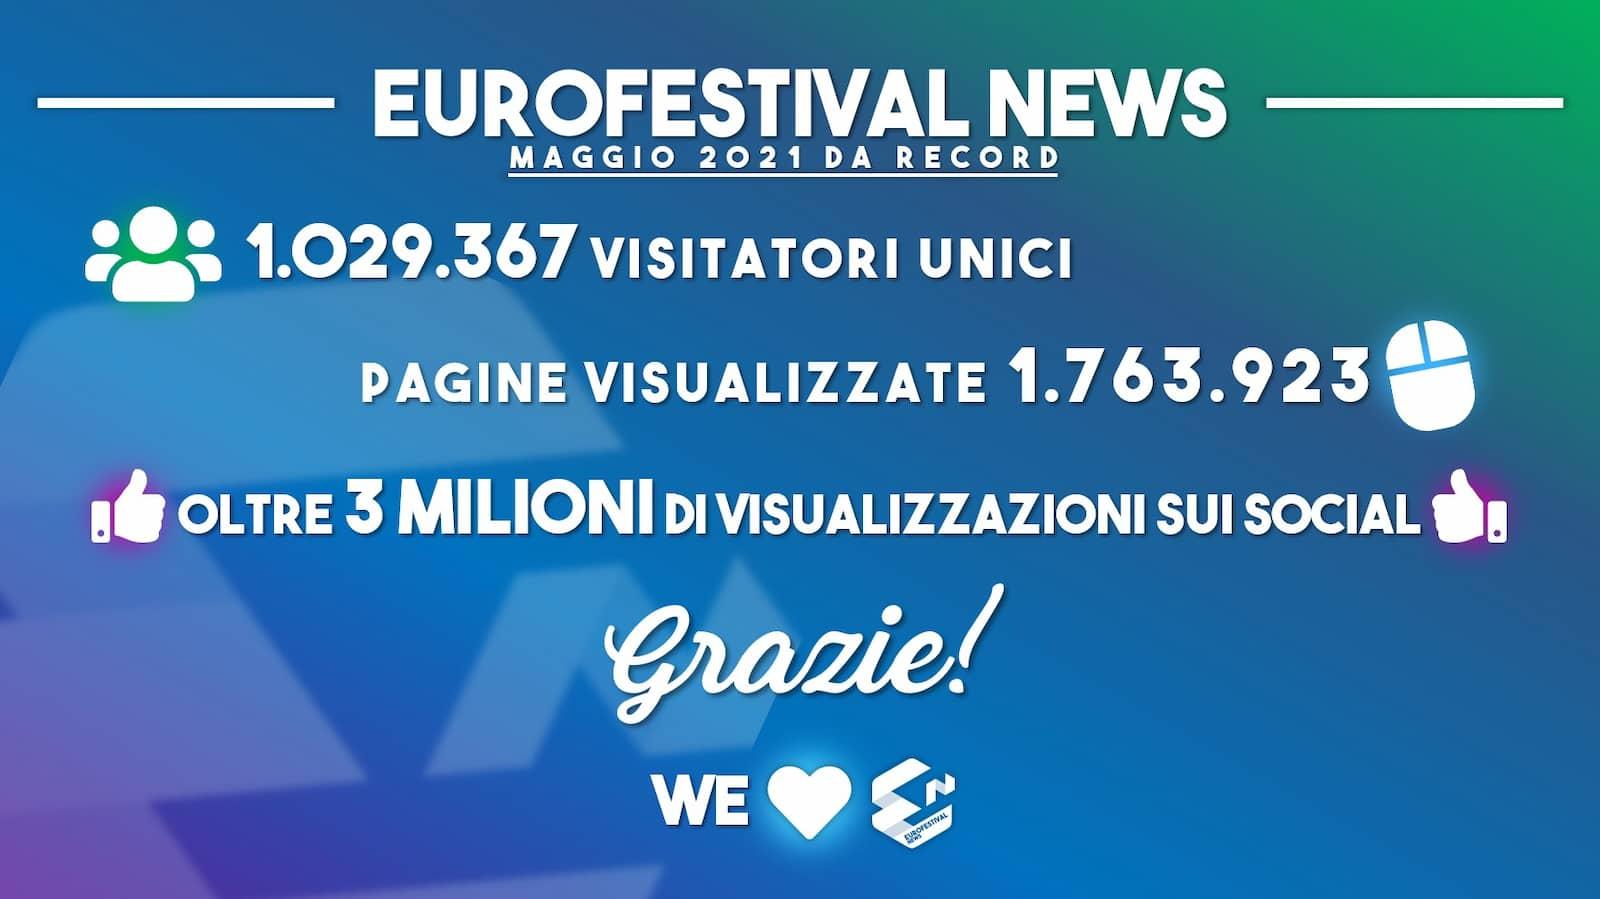 Eurofestival News infografica record Eurovision 2021